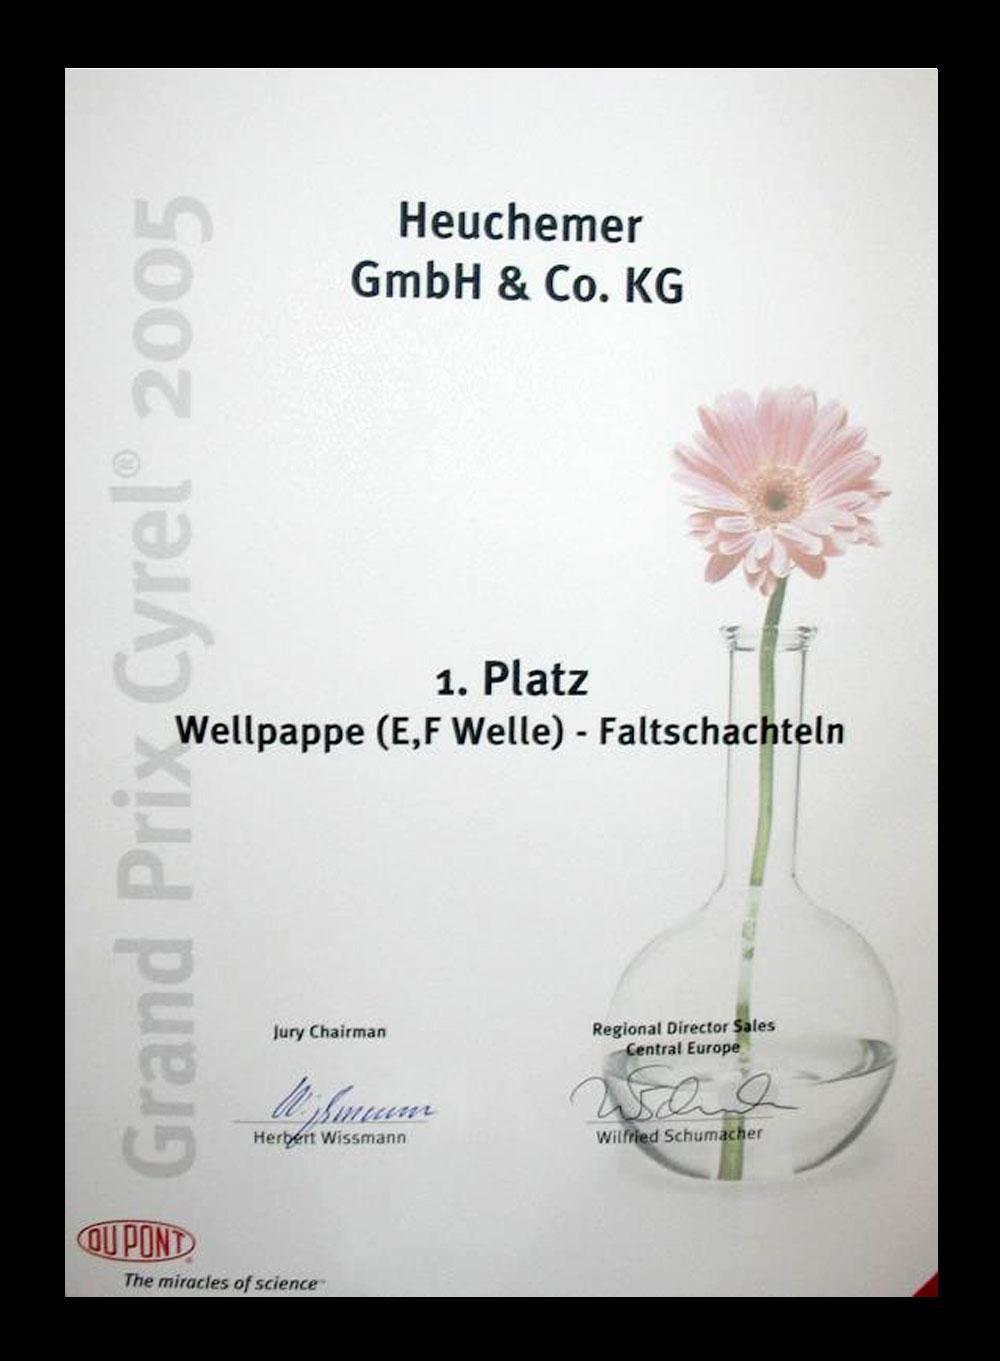 HEUCHEMER VERPACKUNG || Urkunde Grand Prix Cyrel 2005 - 1. Platz Wellpappe (E,F Welle) - Faltschachteln